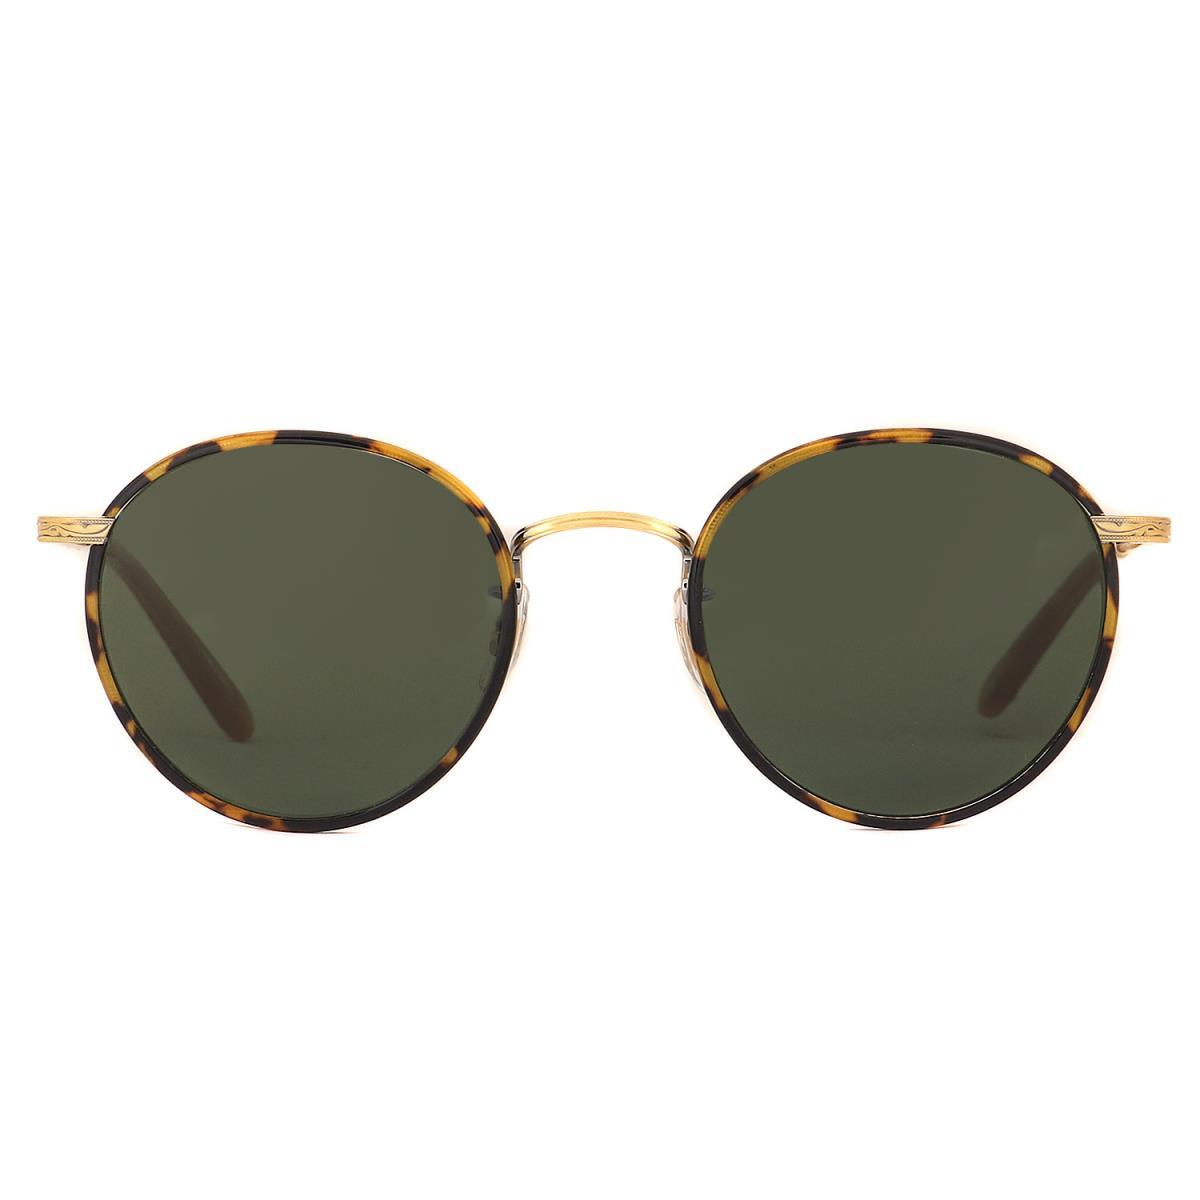 GARRETT LEIGHT ギャレットライト サングラス ラウンド 型 スモークレンズ サングラス WILSON 眼鏡 べっ甲 49□22 【メンズ】【中古】【美品】【K2453】【あす楽☆対応可】